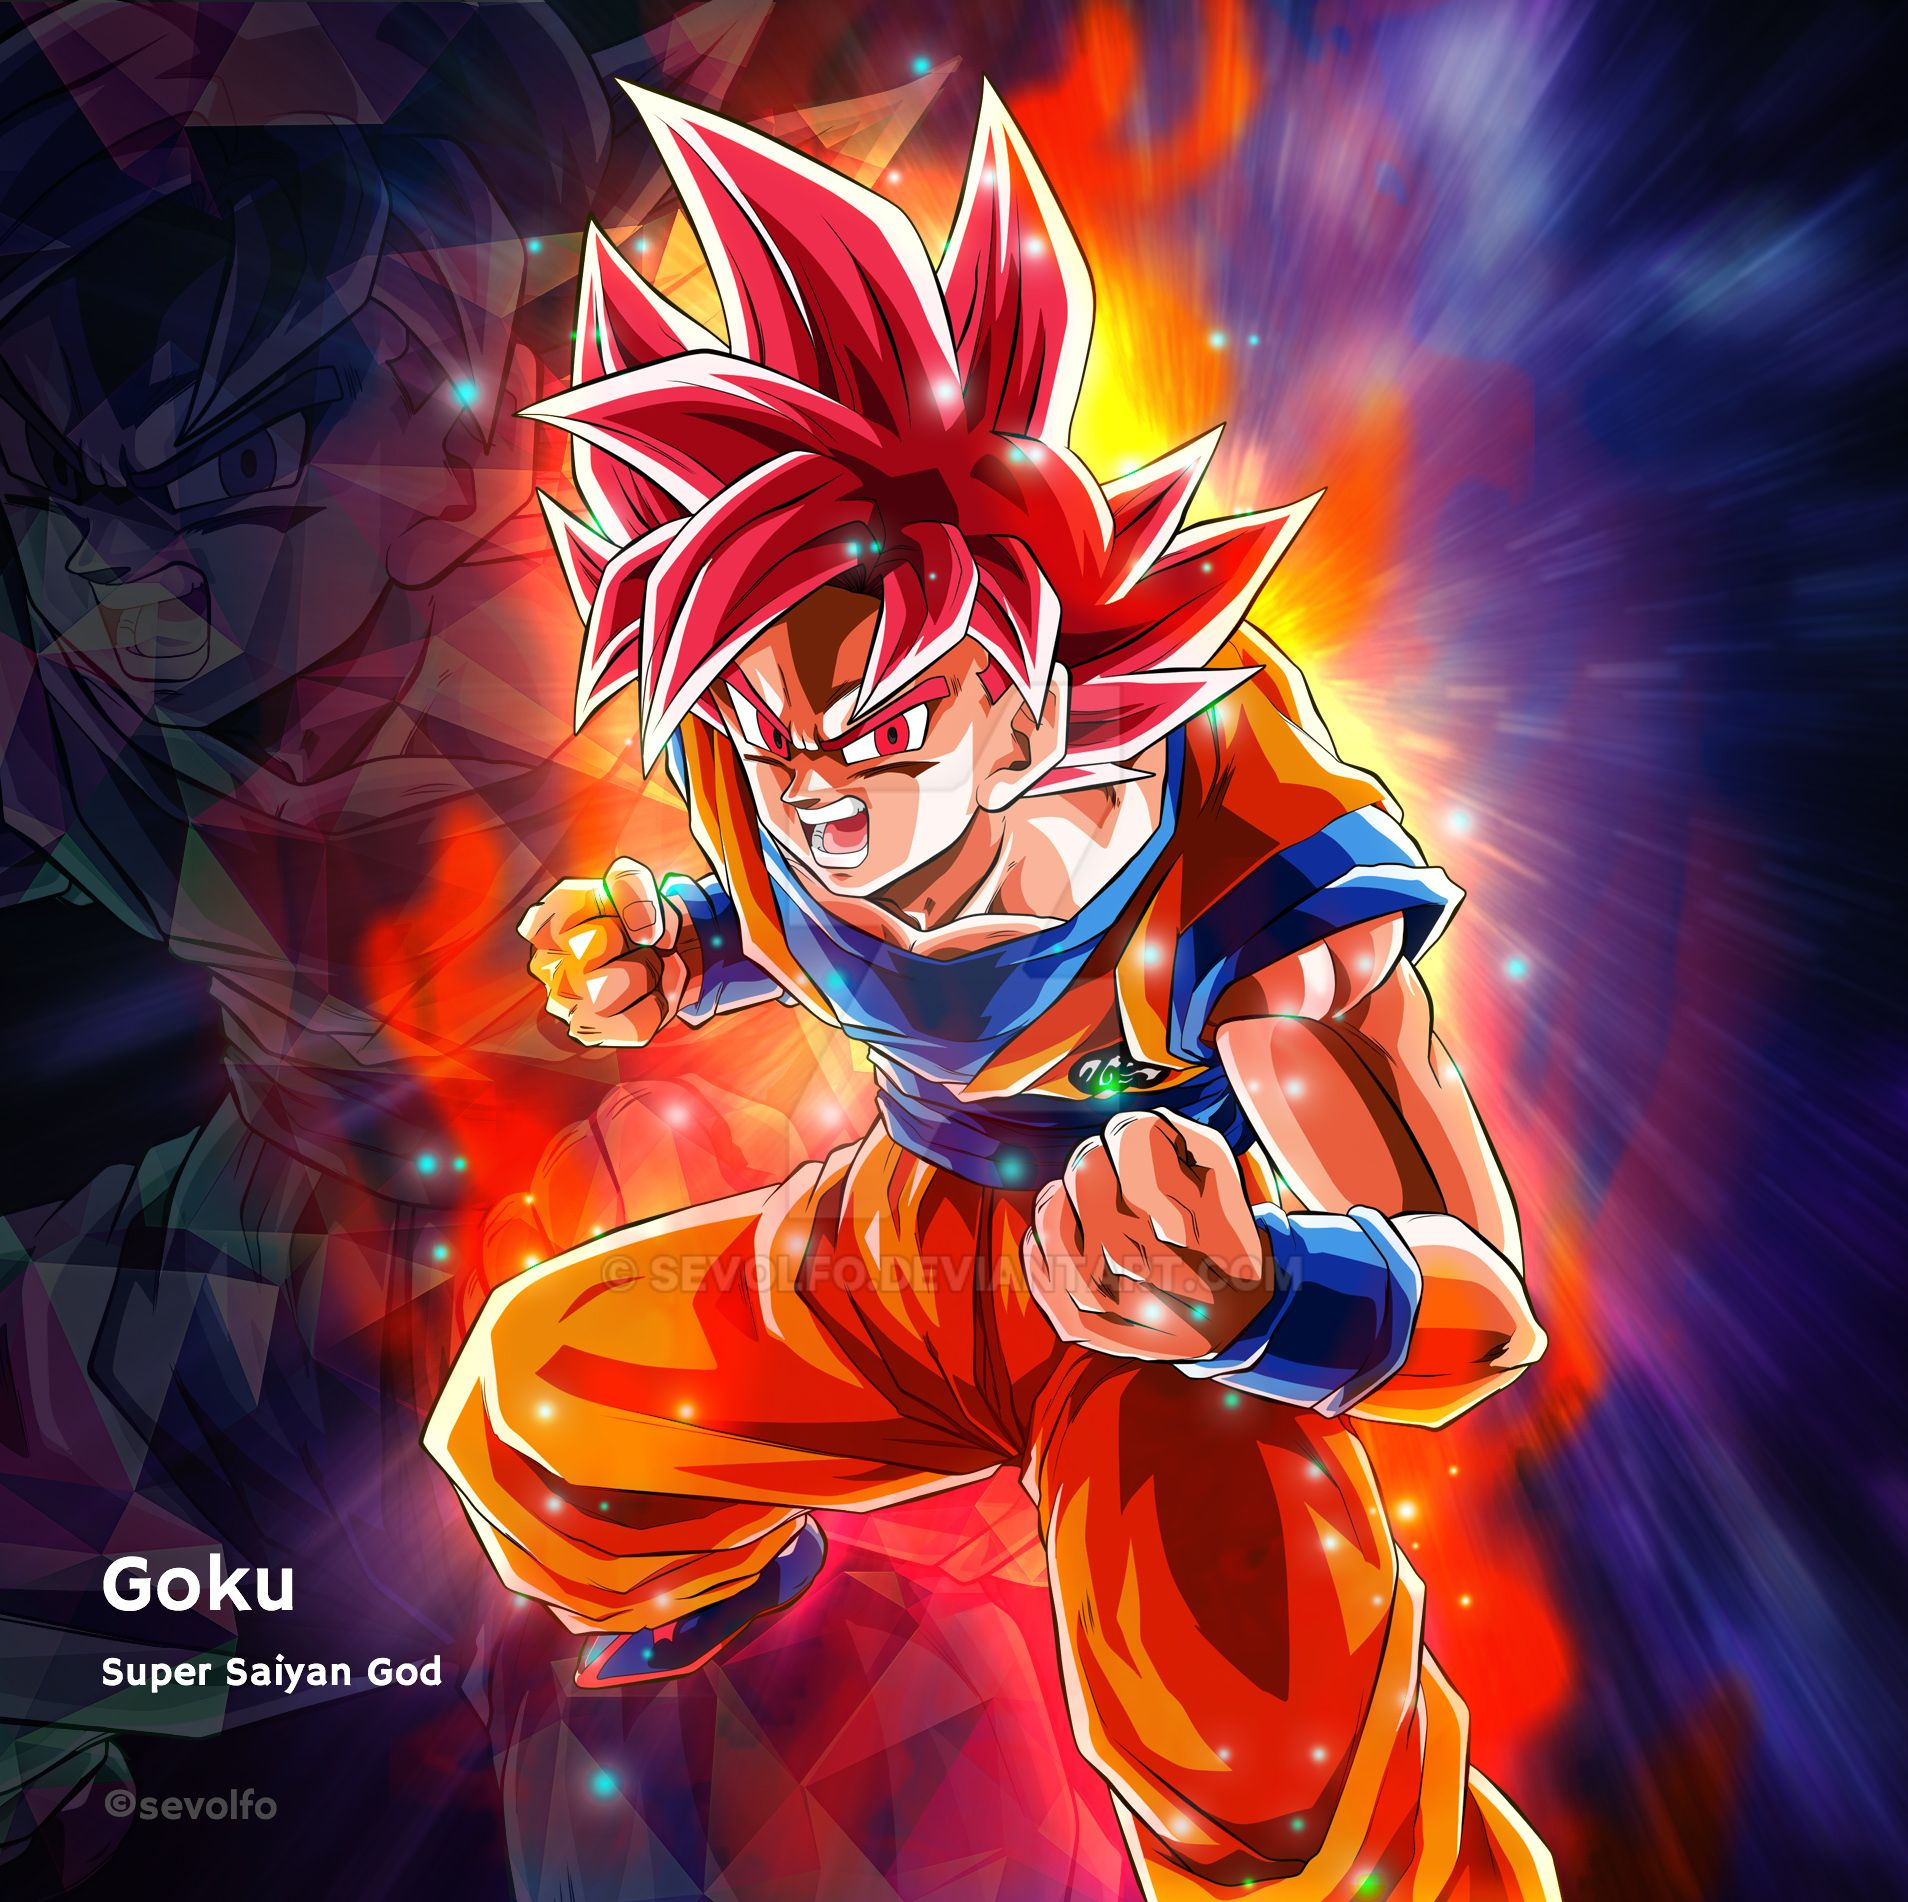 Goku Super Saiyan God by Sevolfo on DeviantArt